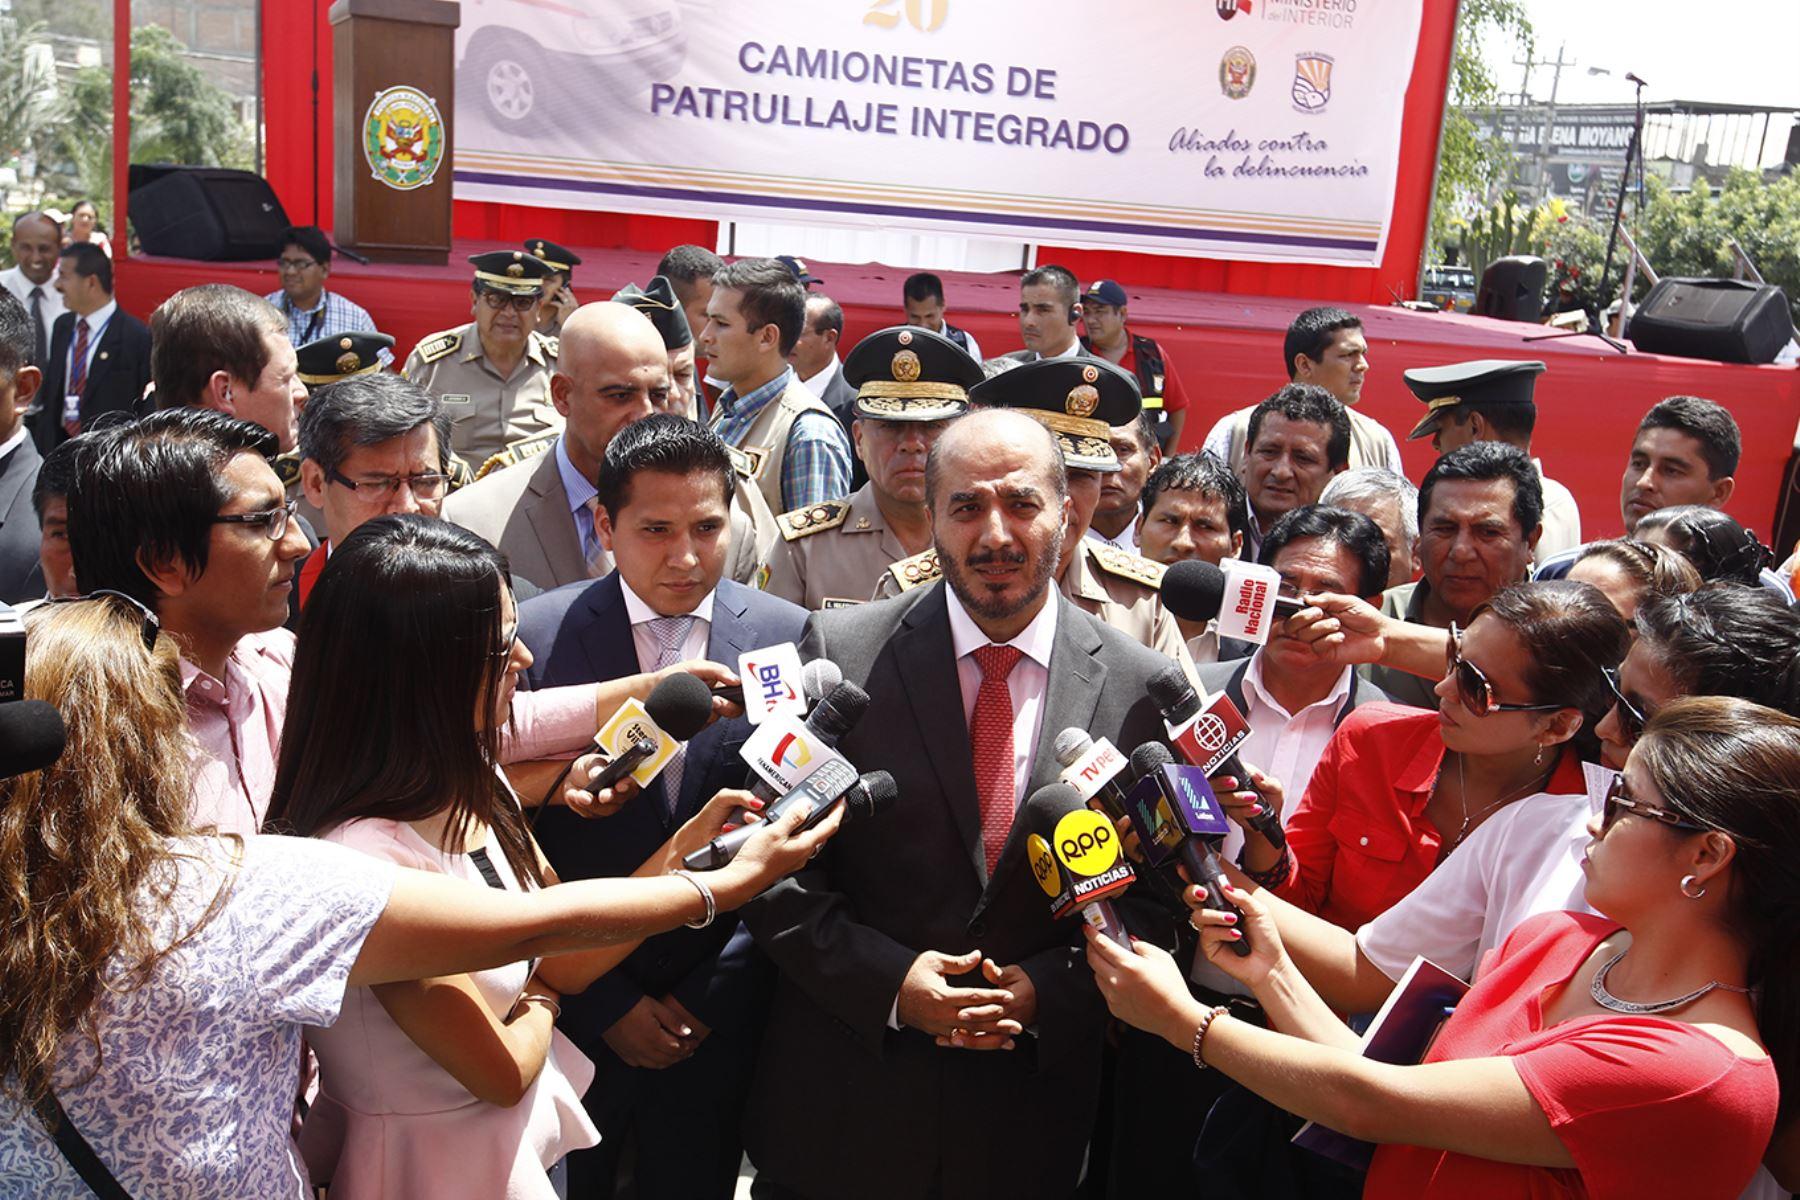 Lima per febrero 27 el ministro del interior jos luis for Nuevo ministro del interior peru